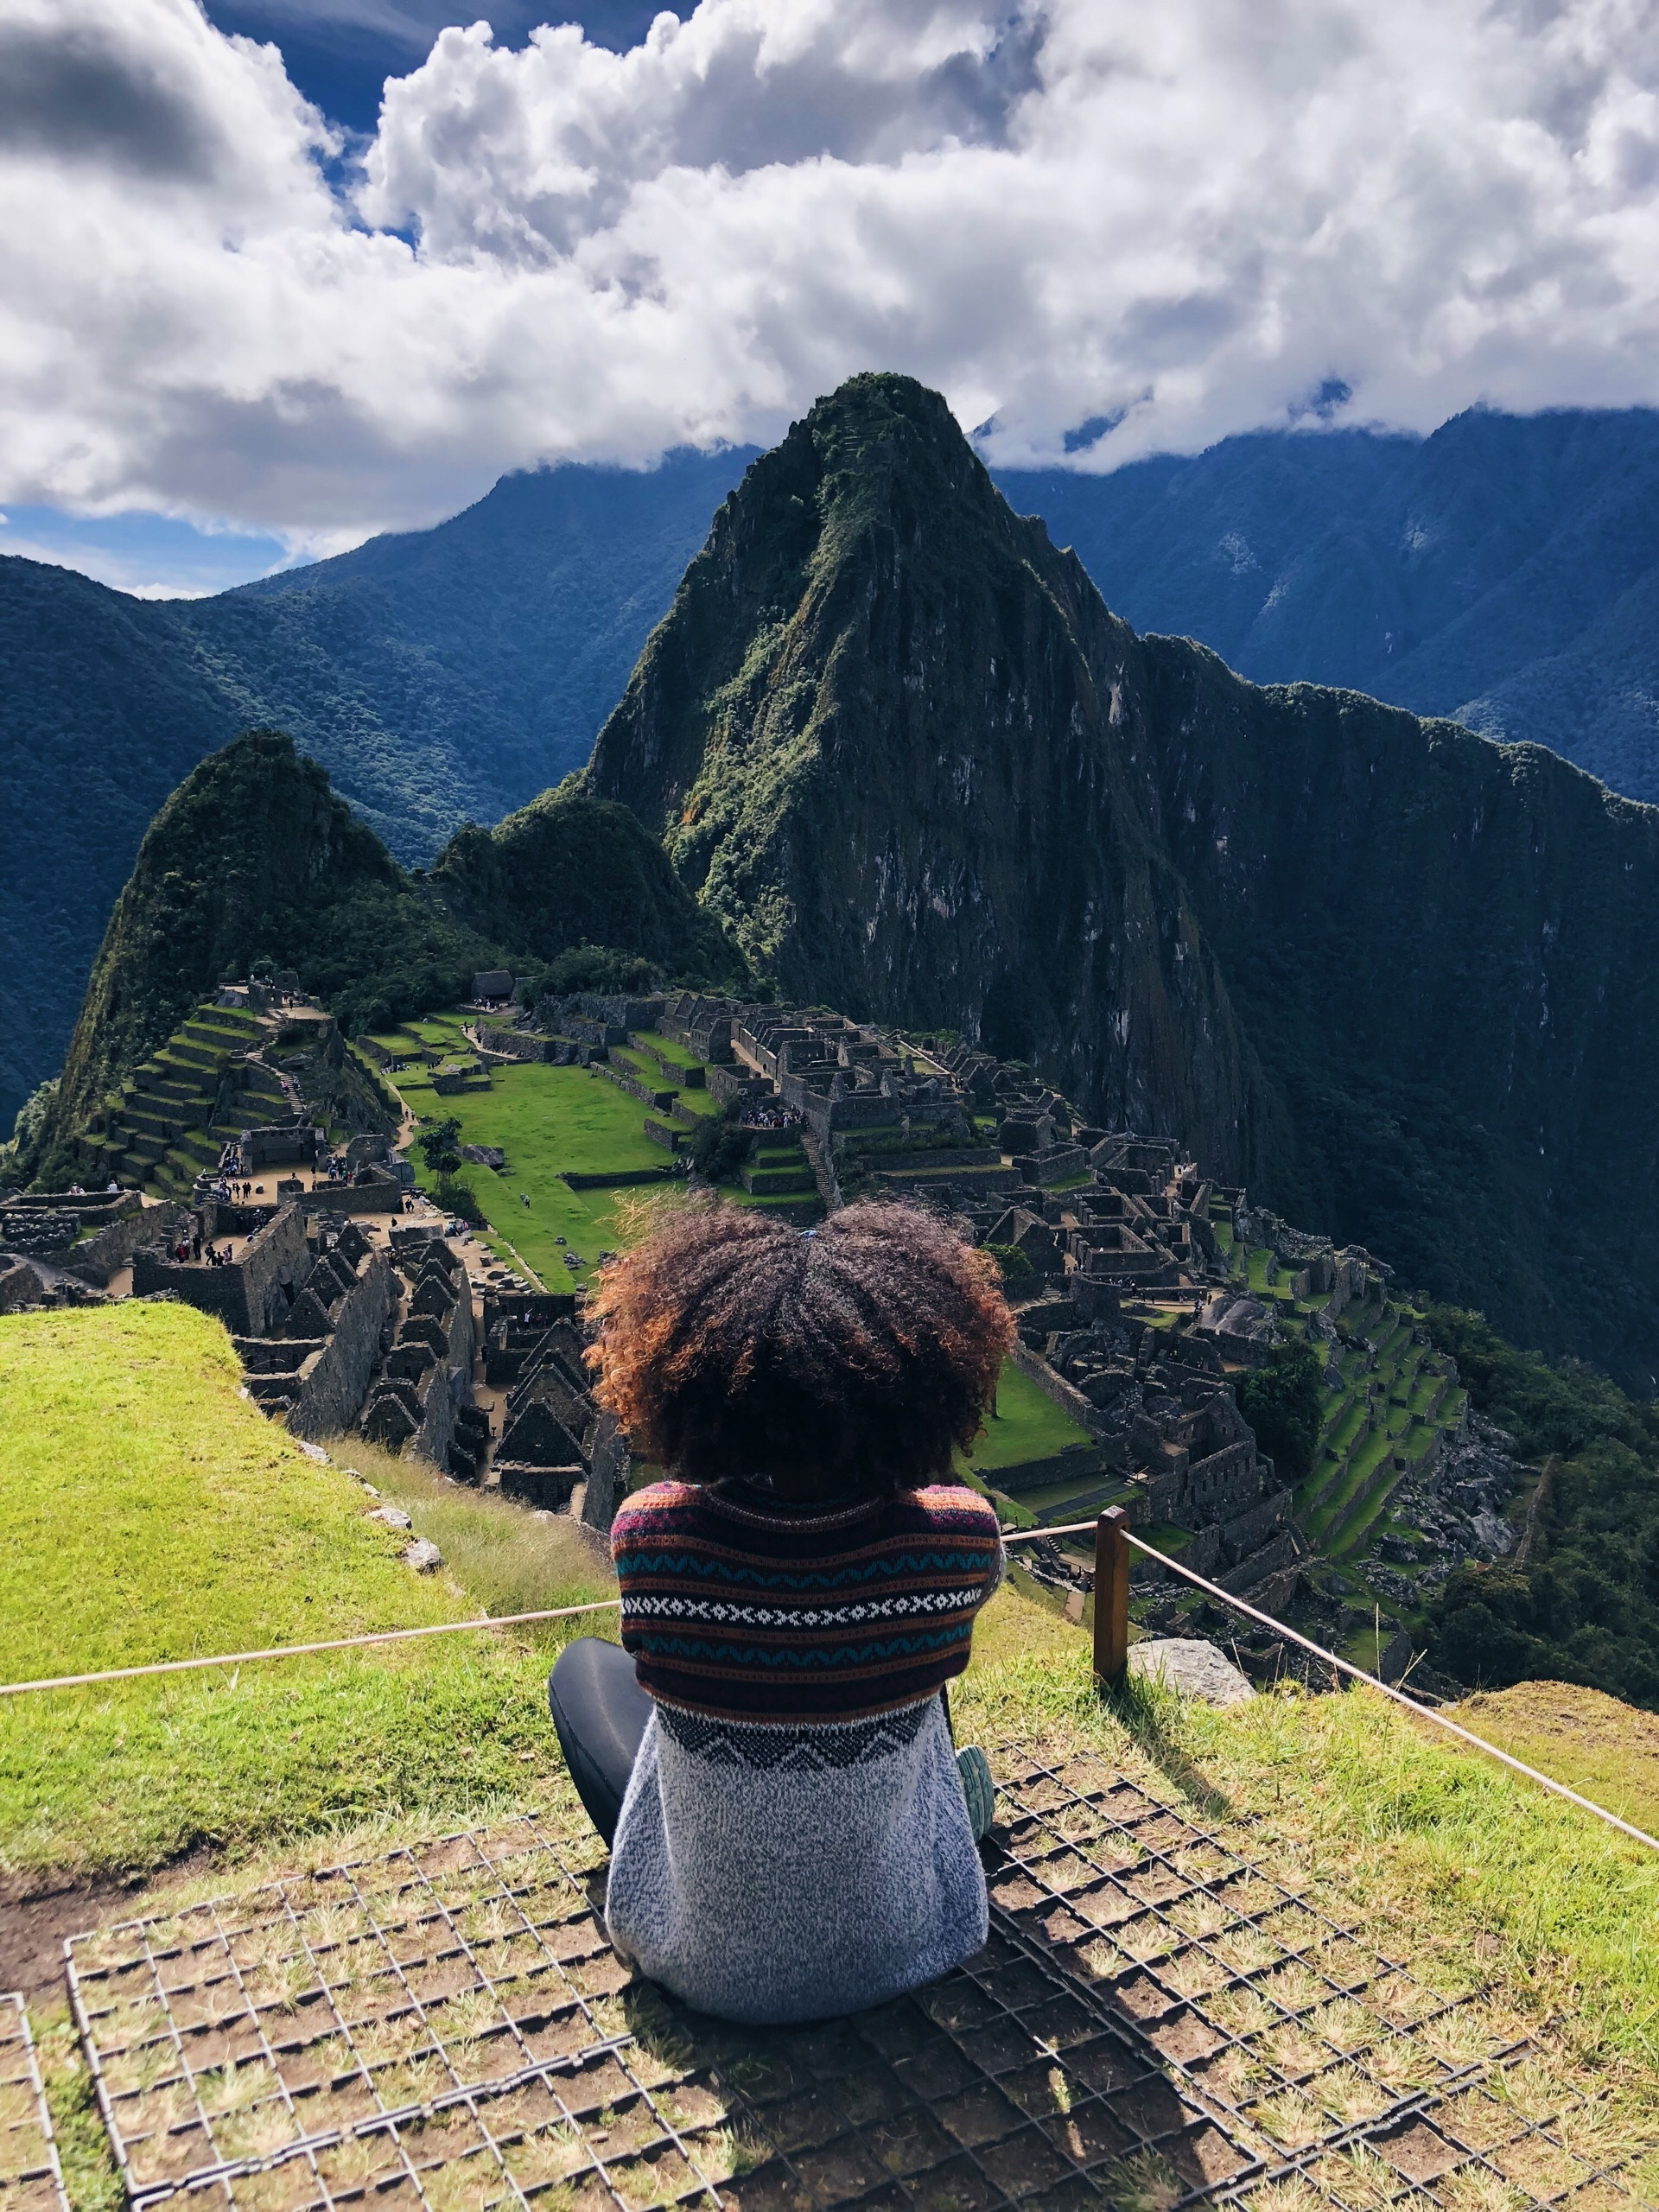 The Ultimate 7 Day Peru Itinerary- Visiting Machu Picchu